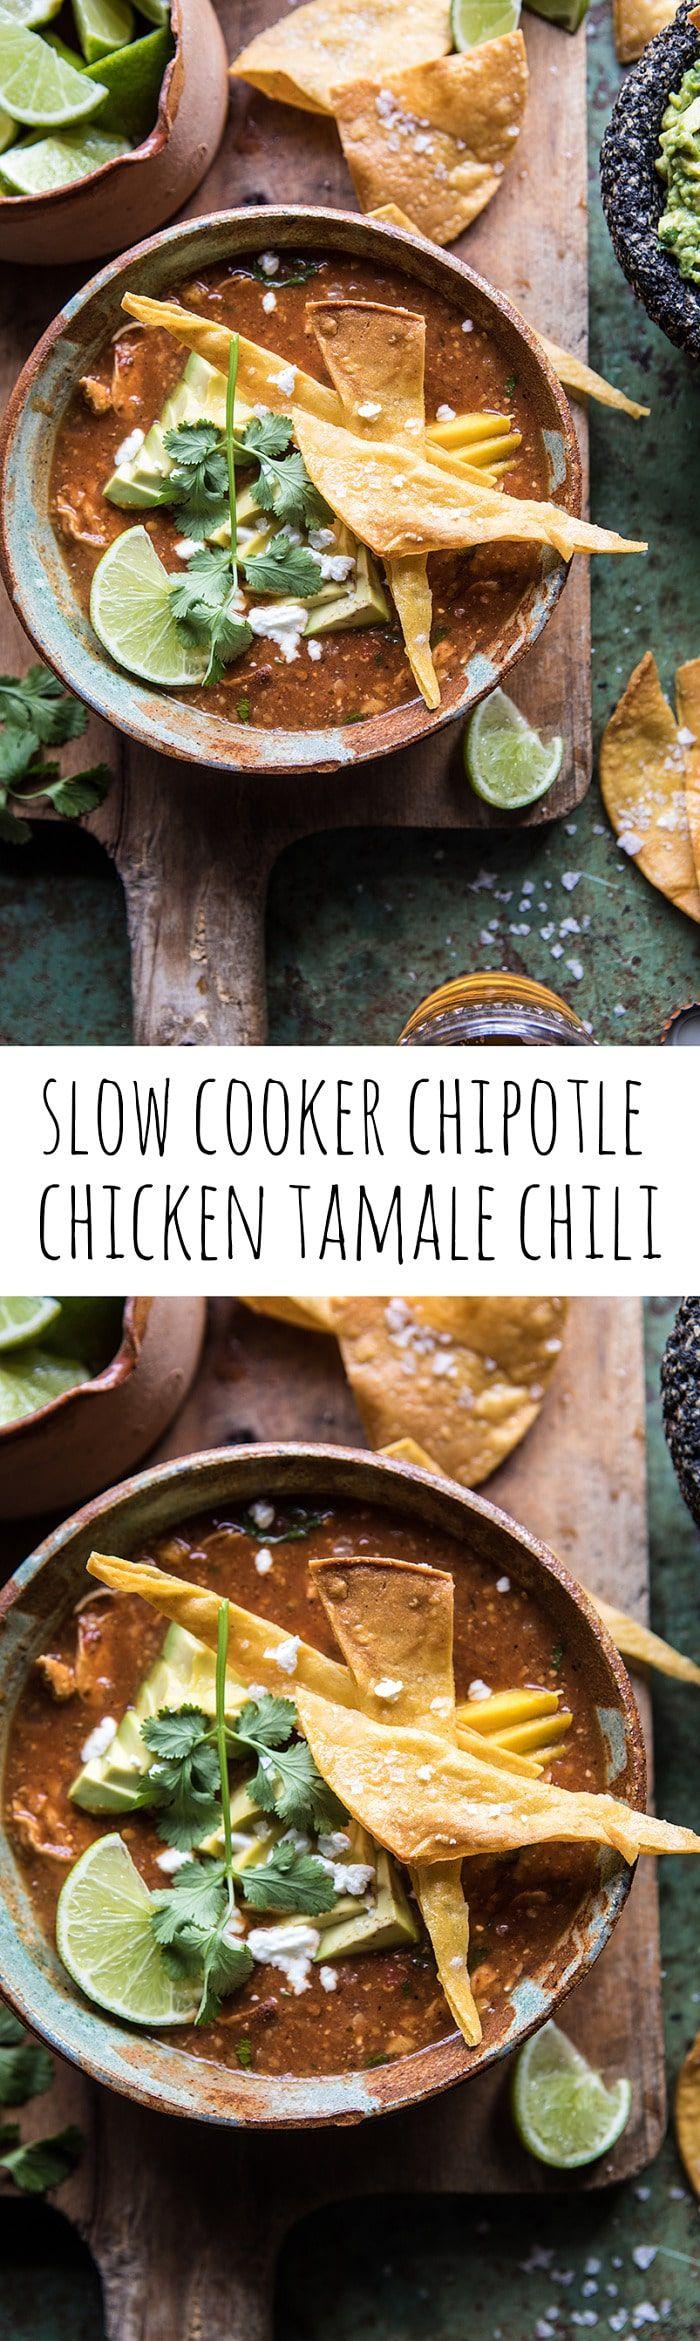 Slow Cooker Chipotle Chicken Tamale Chili | halfbakedharvest.com @hbharvest